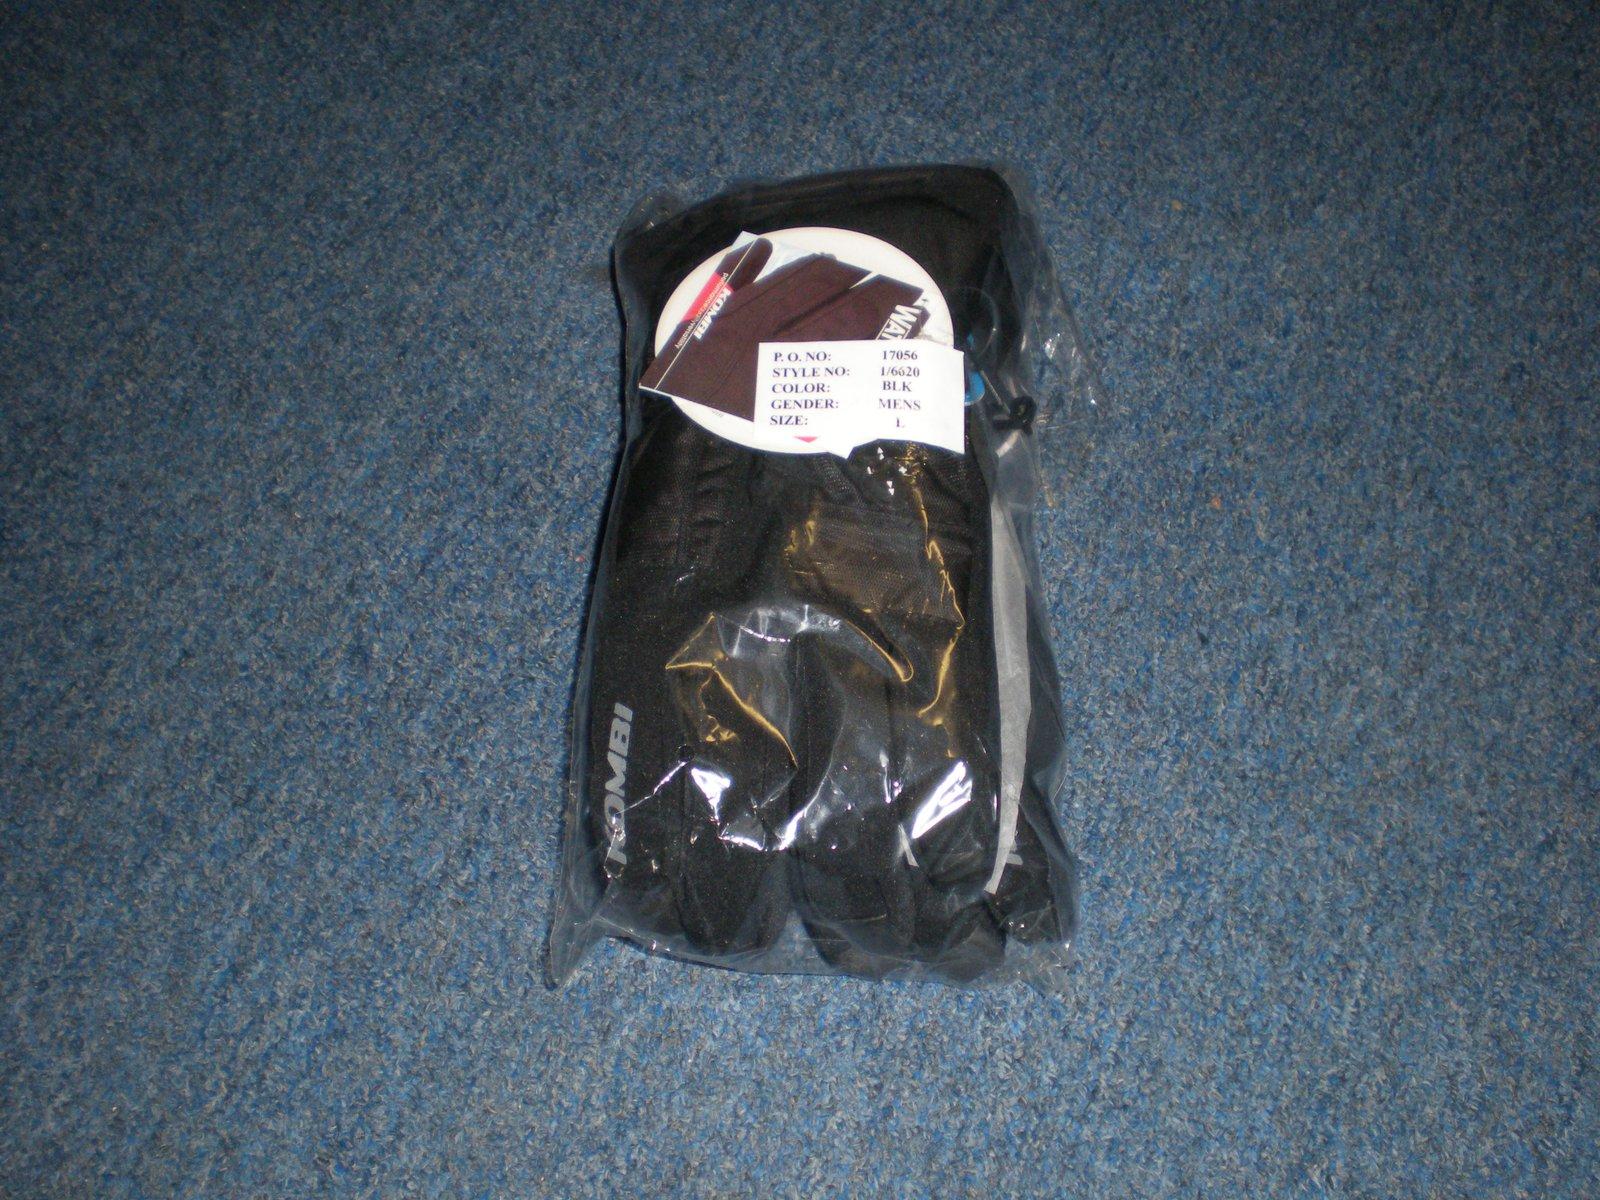 Kiombi iRip Glove 2 (for thread)